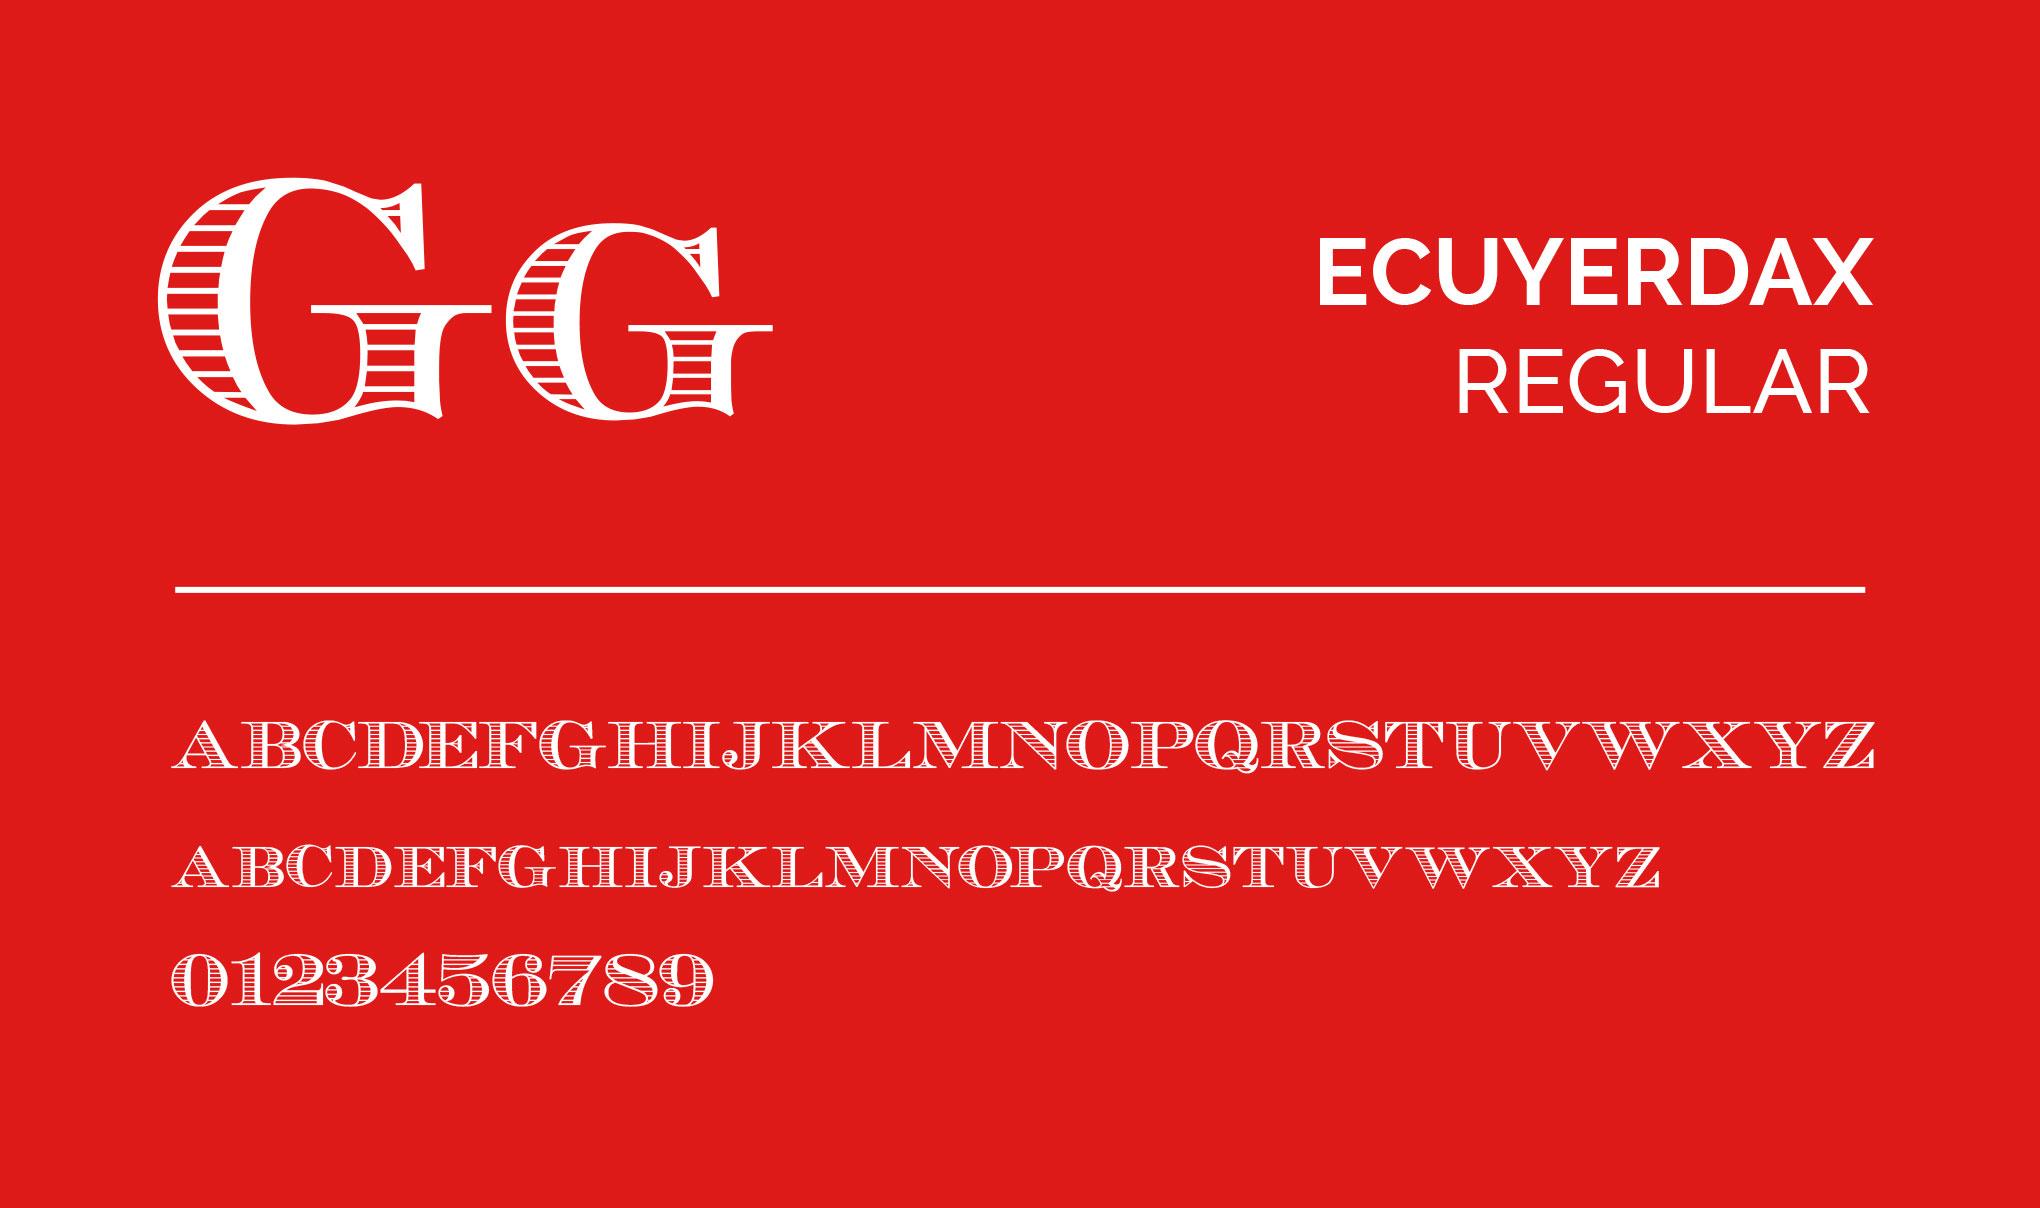 ECUYERDAX Regular font.